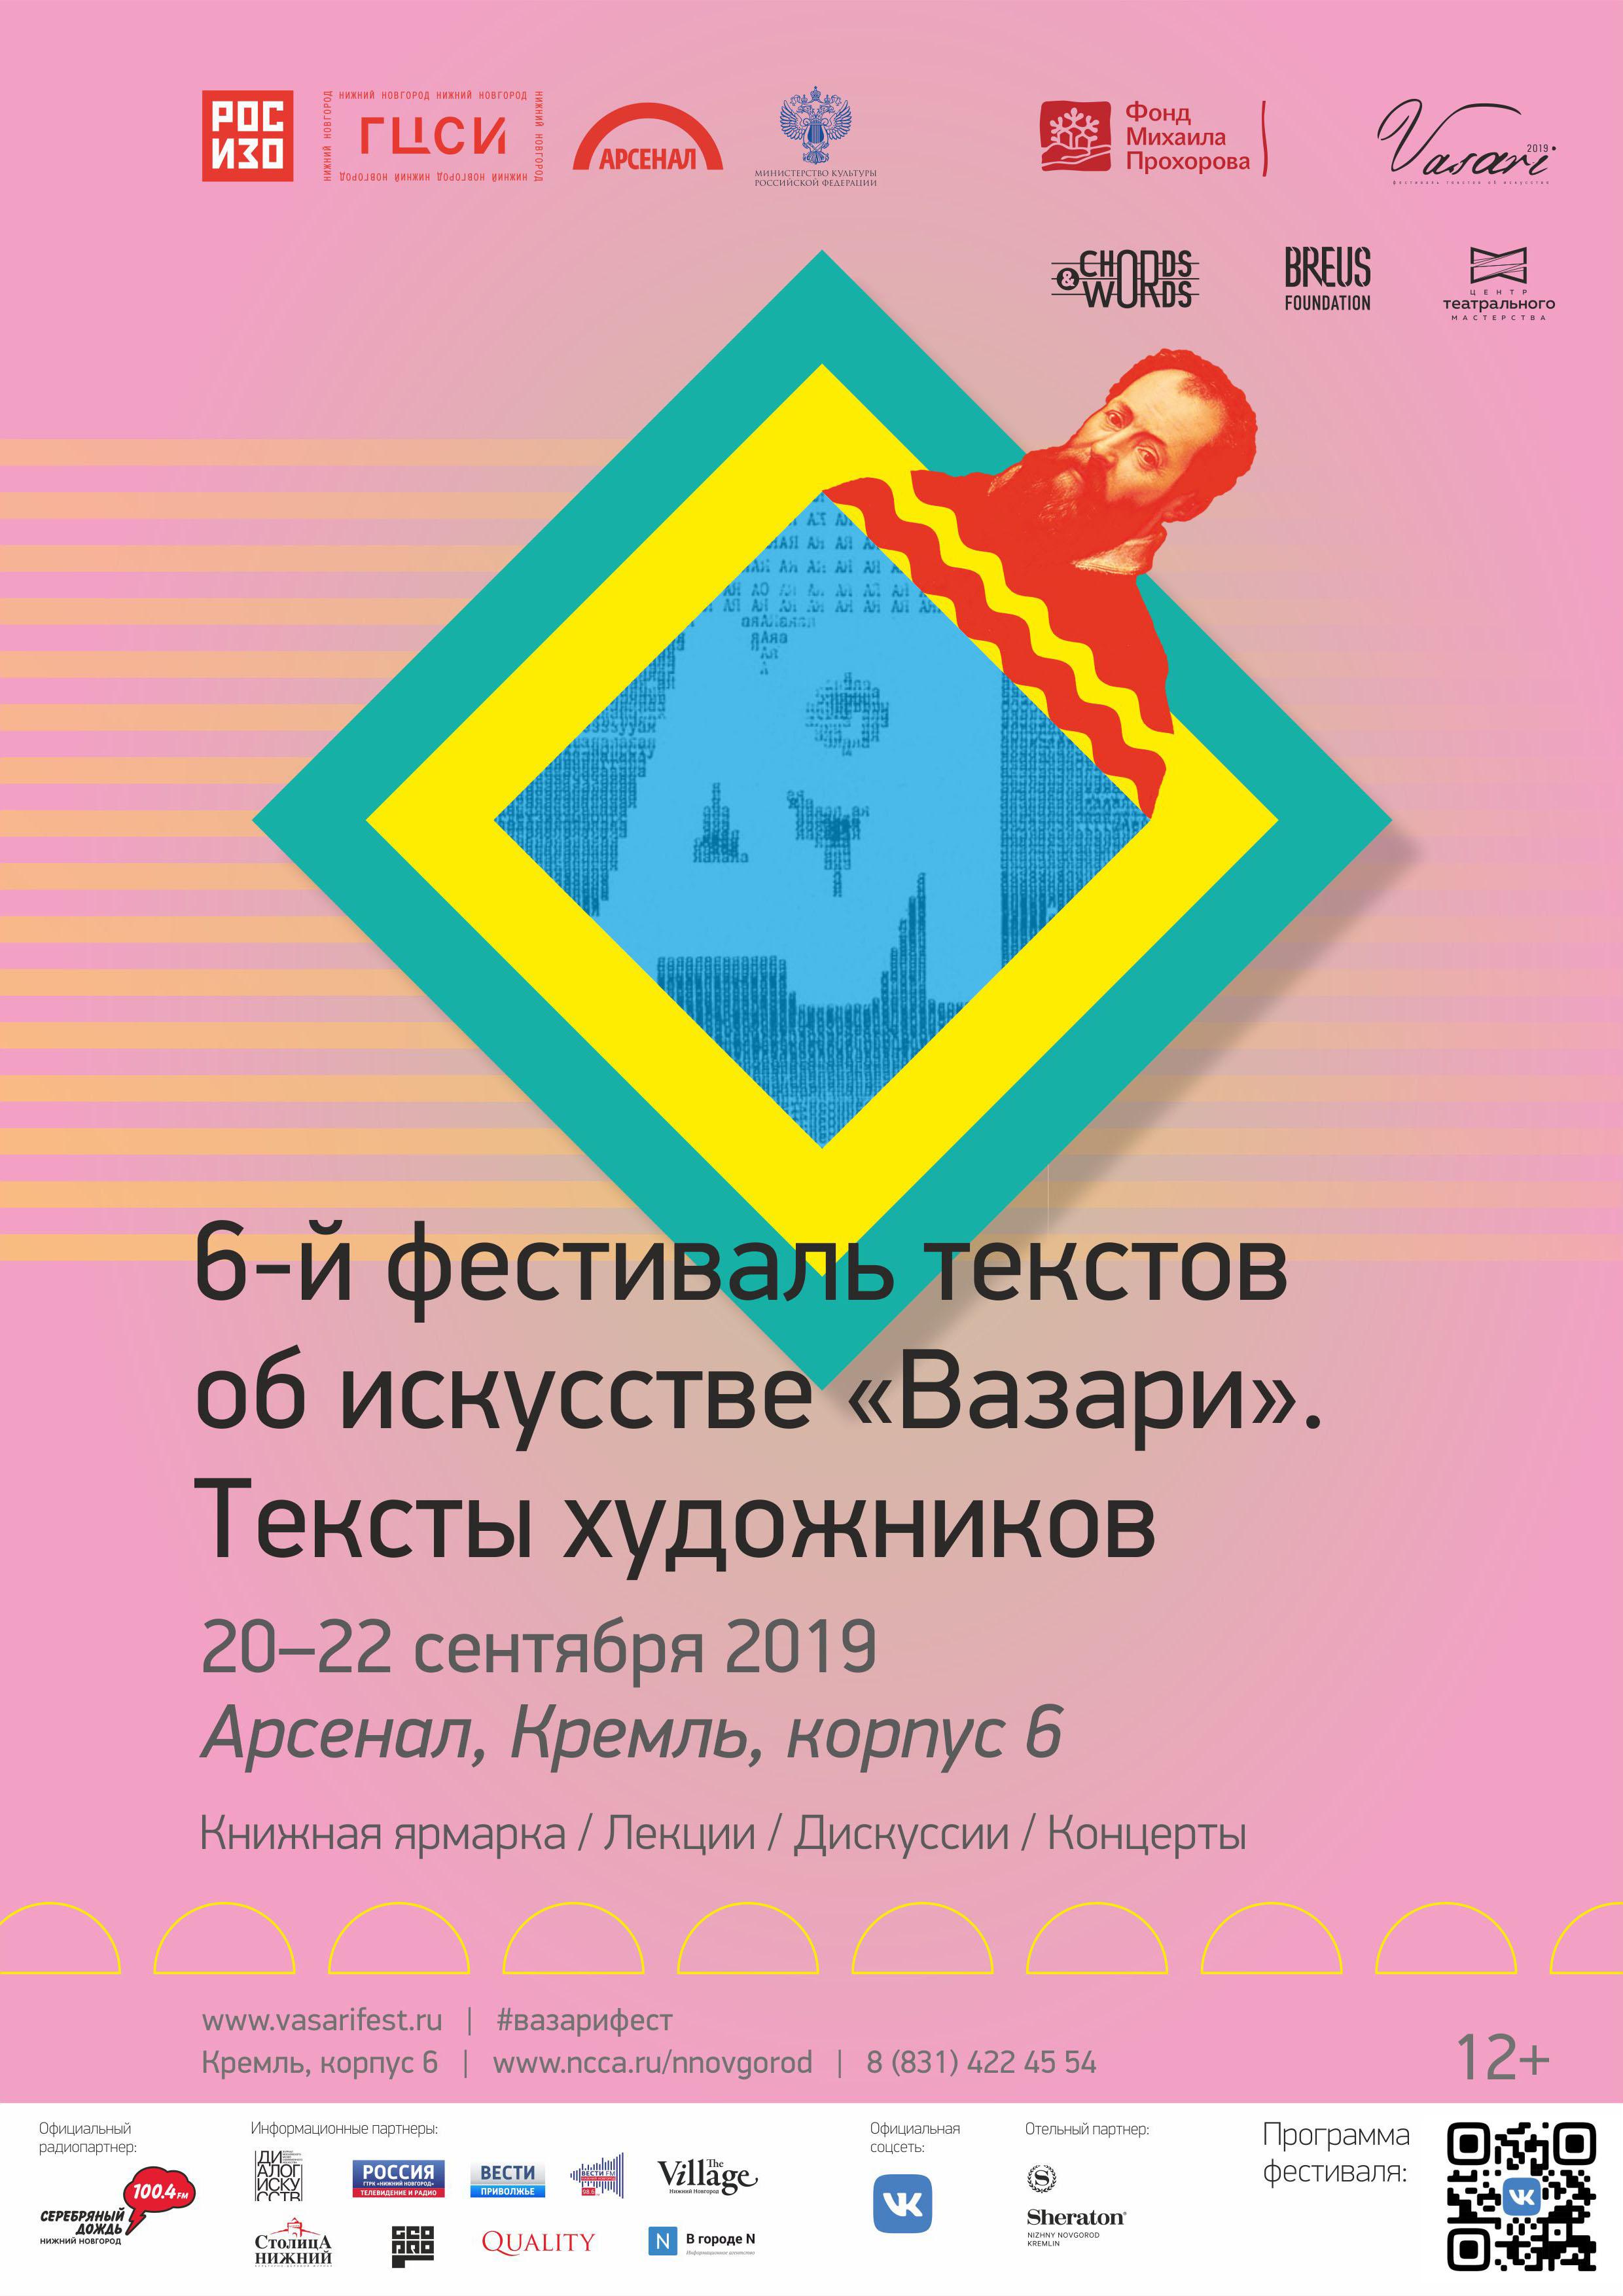 Фестиваль текстов об искусстве Вазари